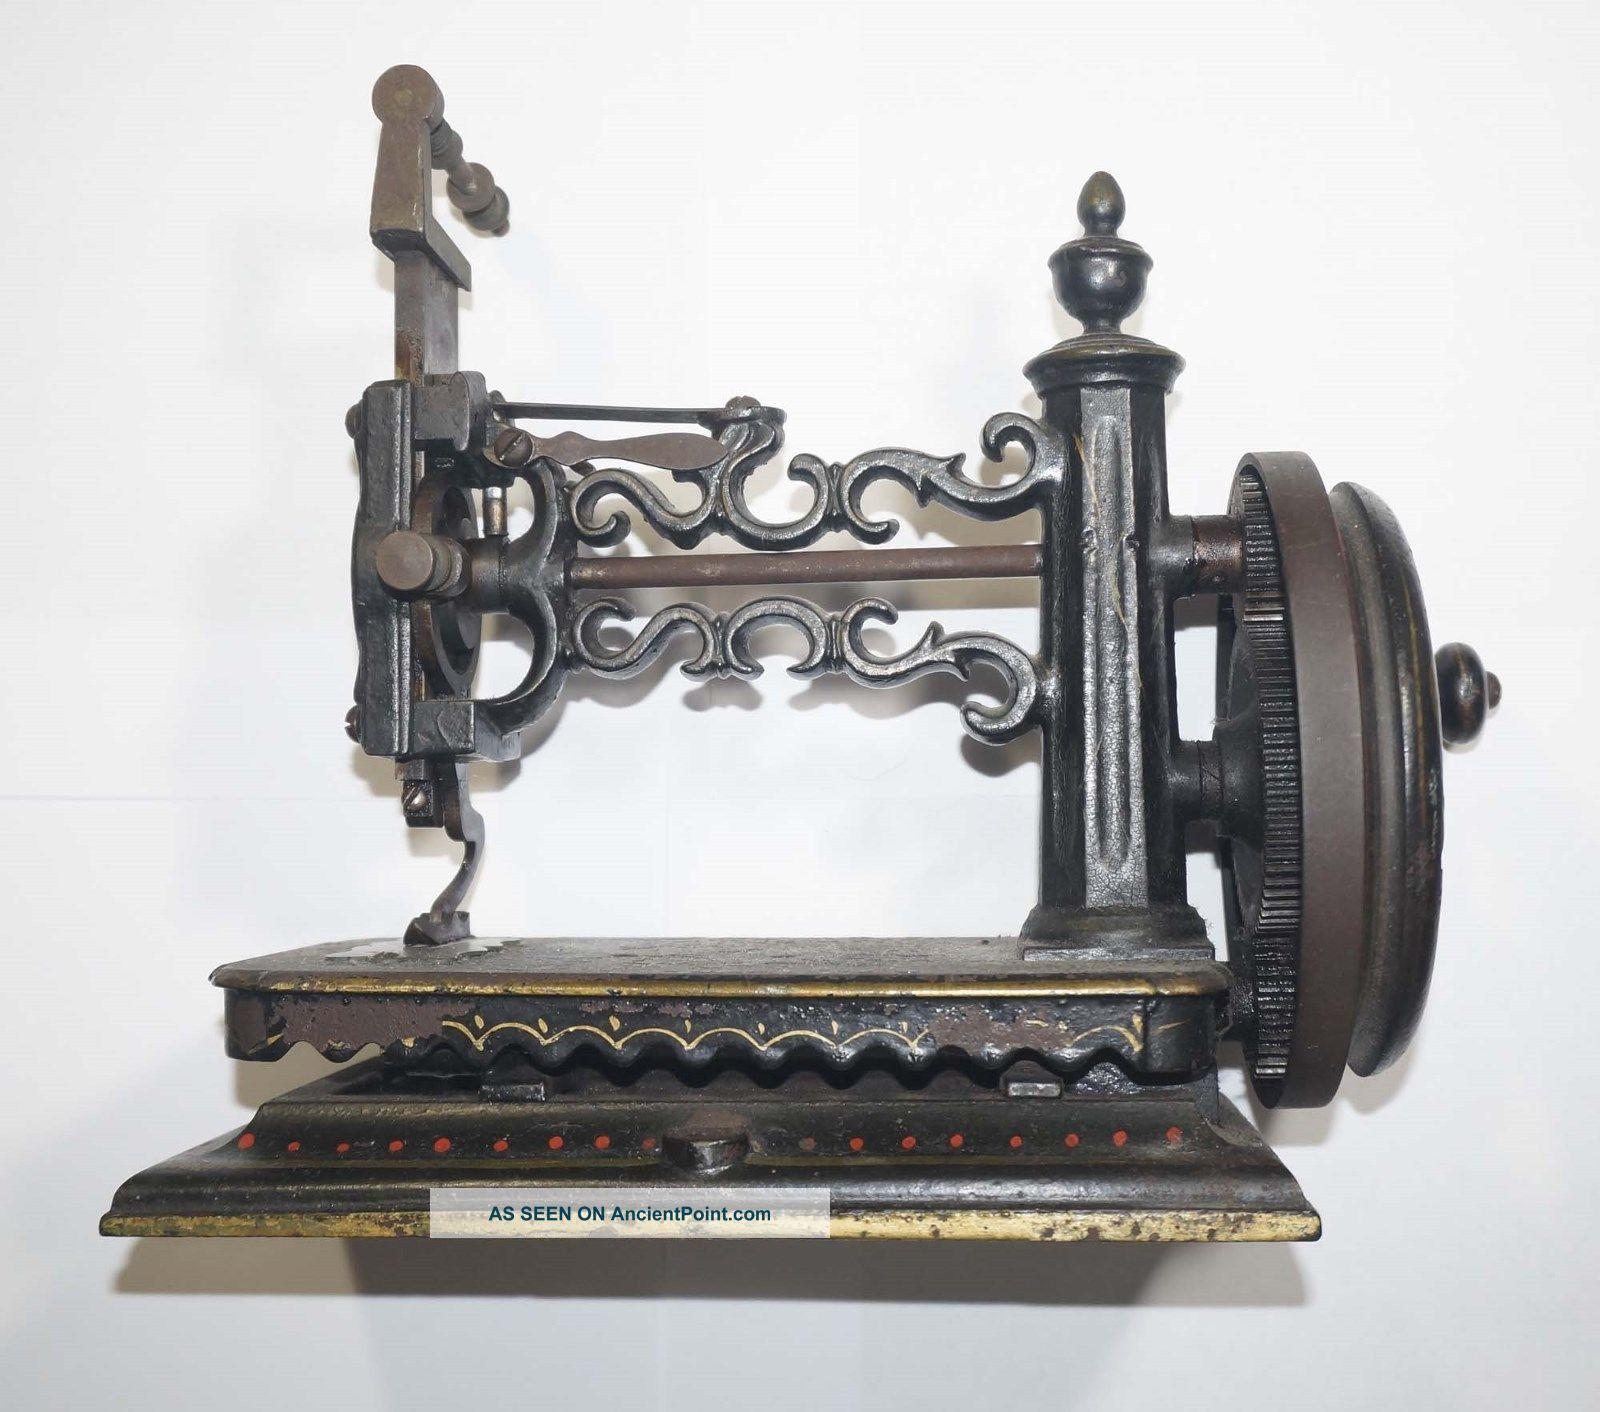 Rare Antique Shaw & Clark,  Biddeford Maine,  Hand Crank Sewing Machine C.  1860 Sewing Machines photo